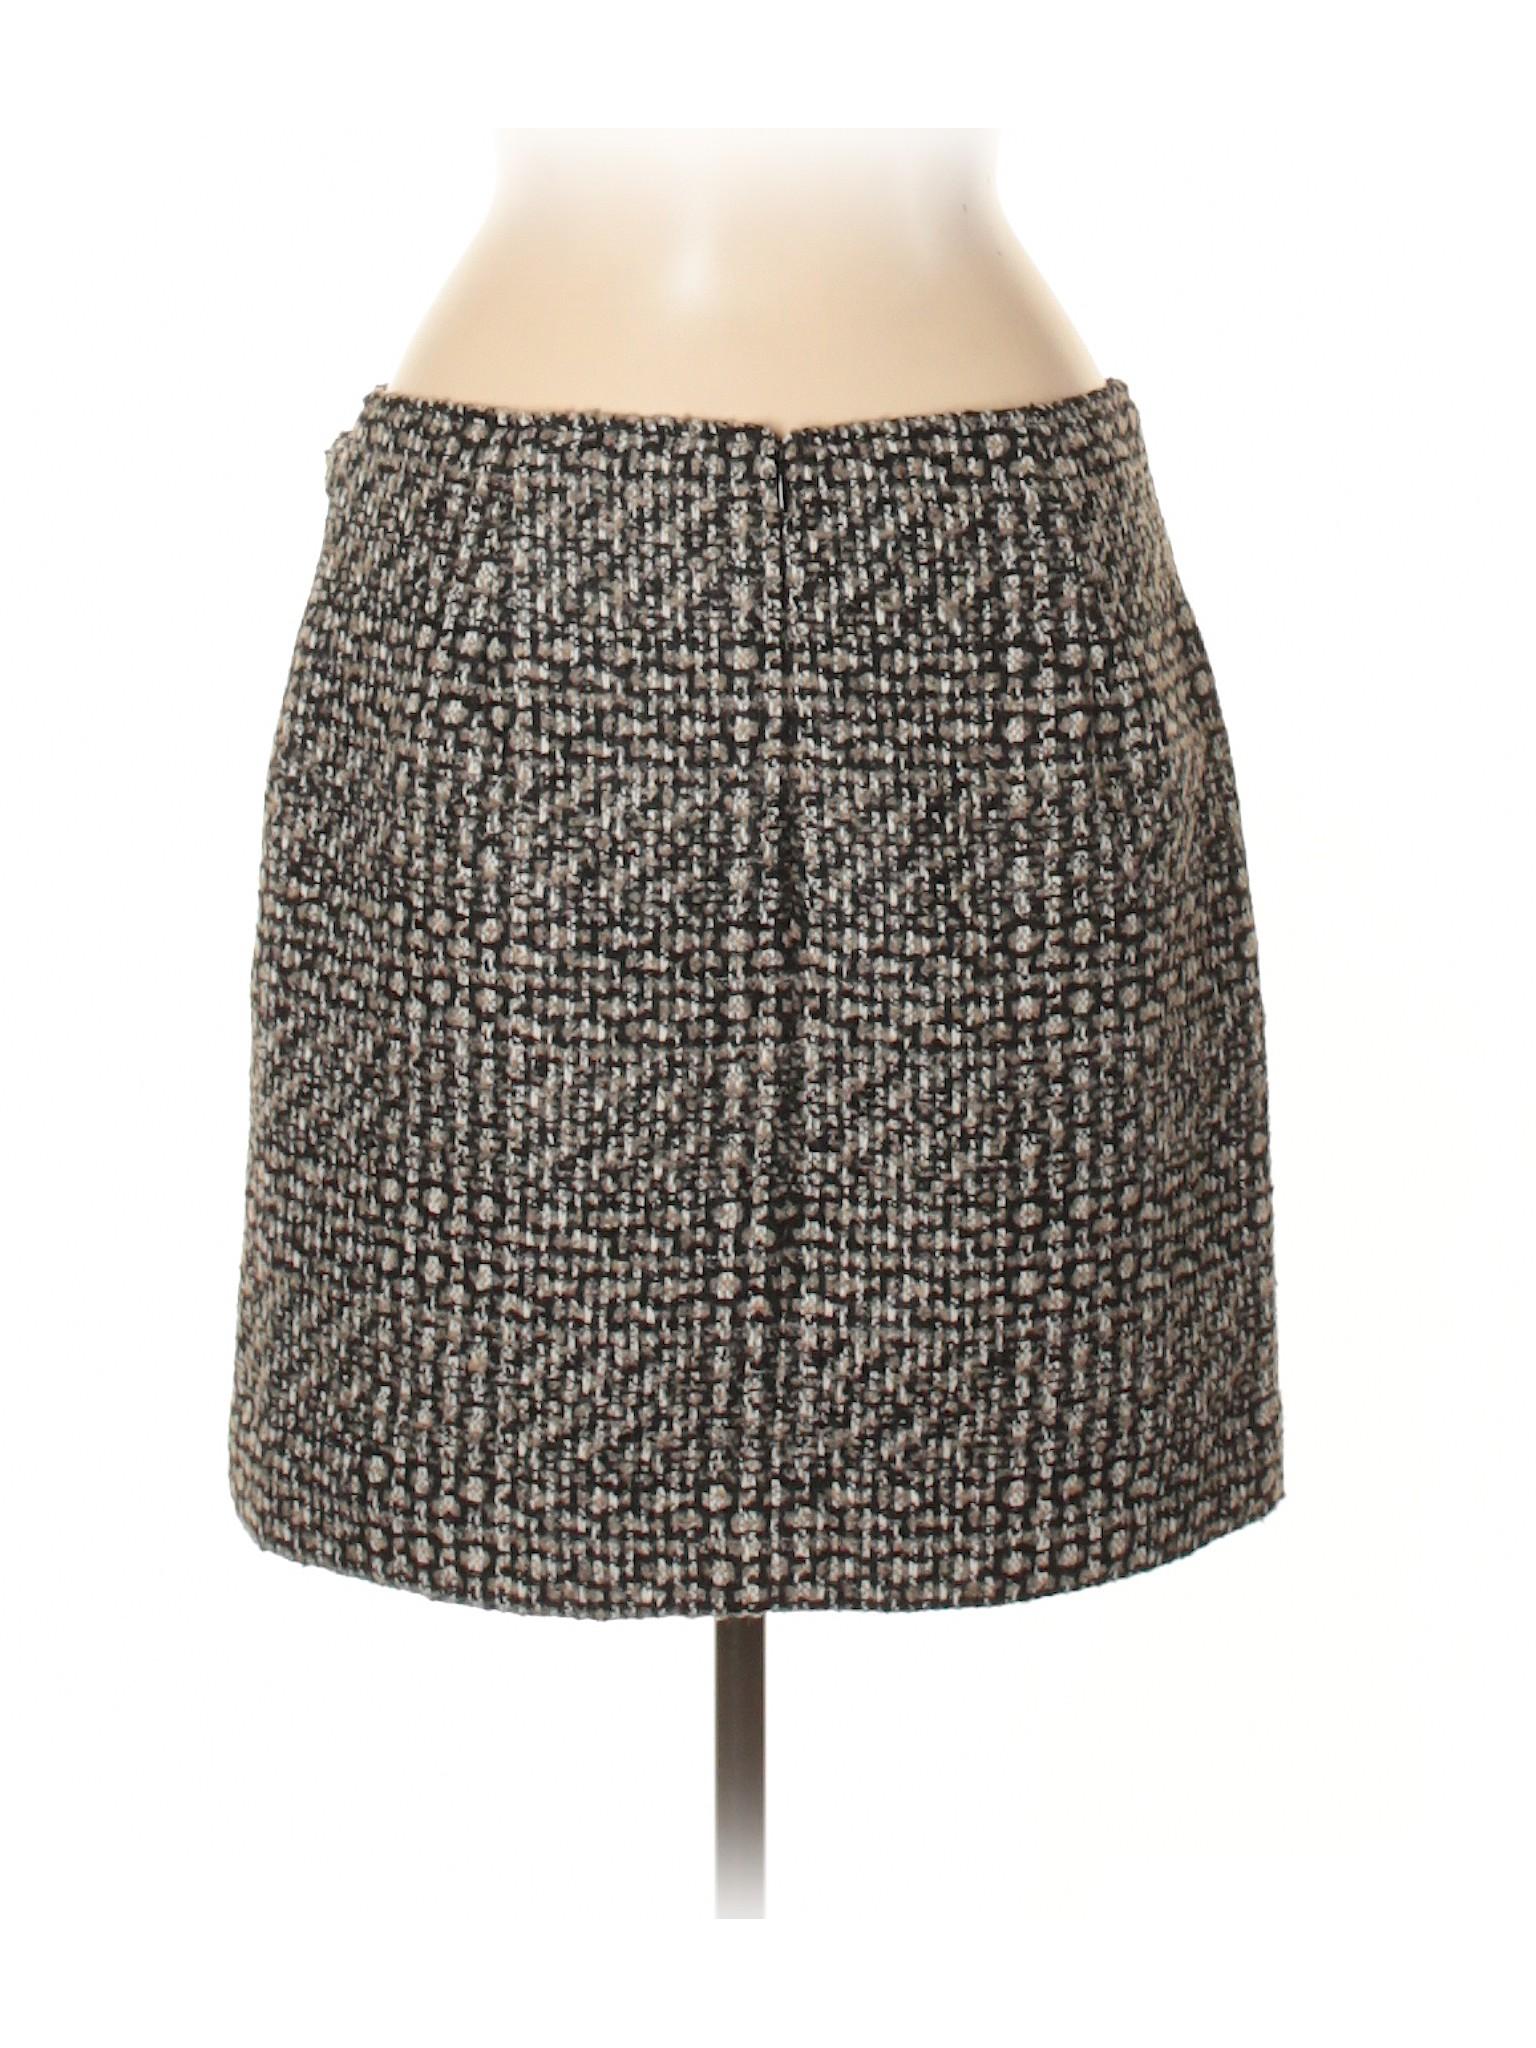 Skirt Casual Skirt Boutique Boutique Skirt Boutique Casual Skirt Casual Casual Boutique Casual Boutique Skirt Boutique xIFfwf